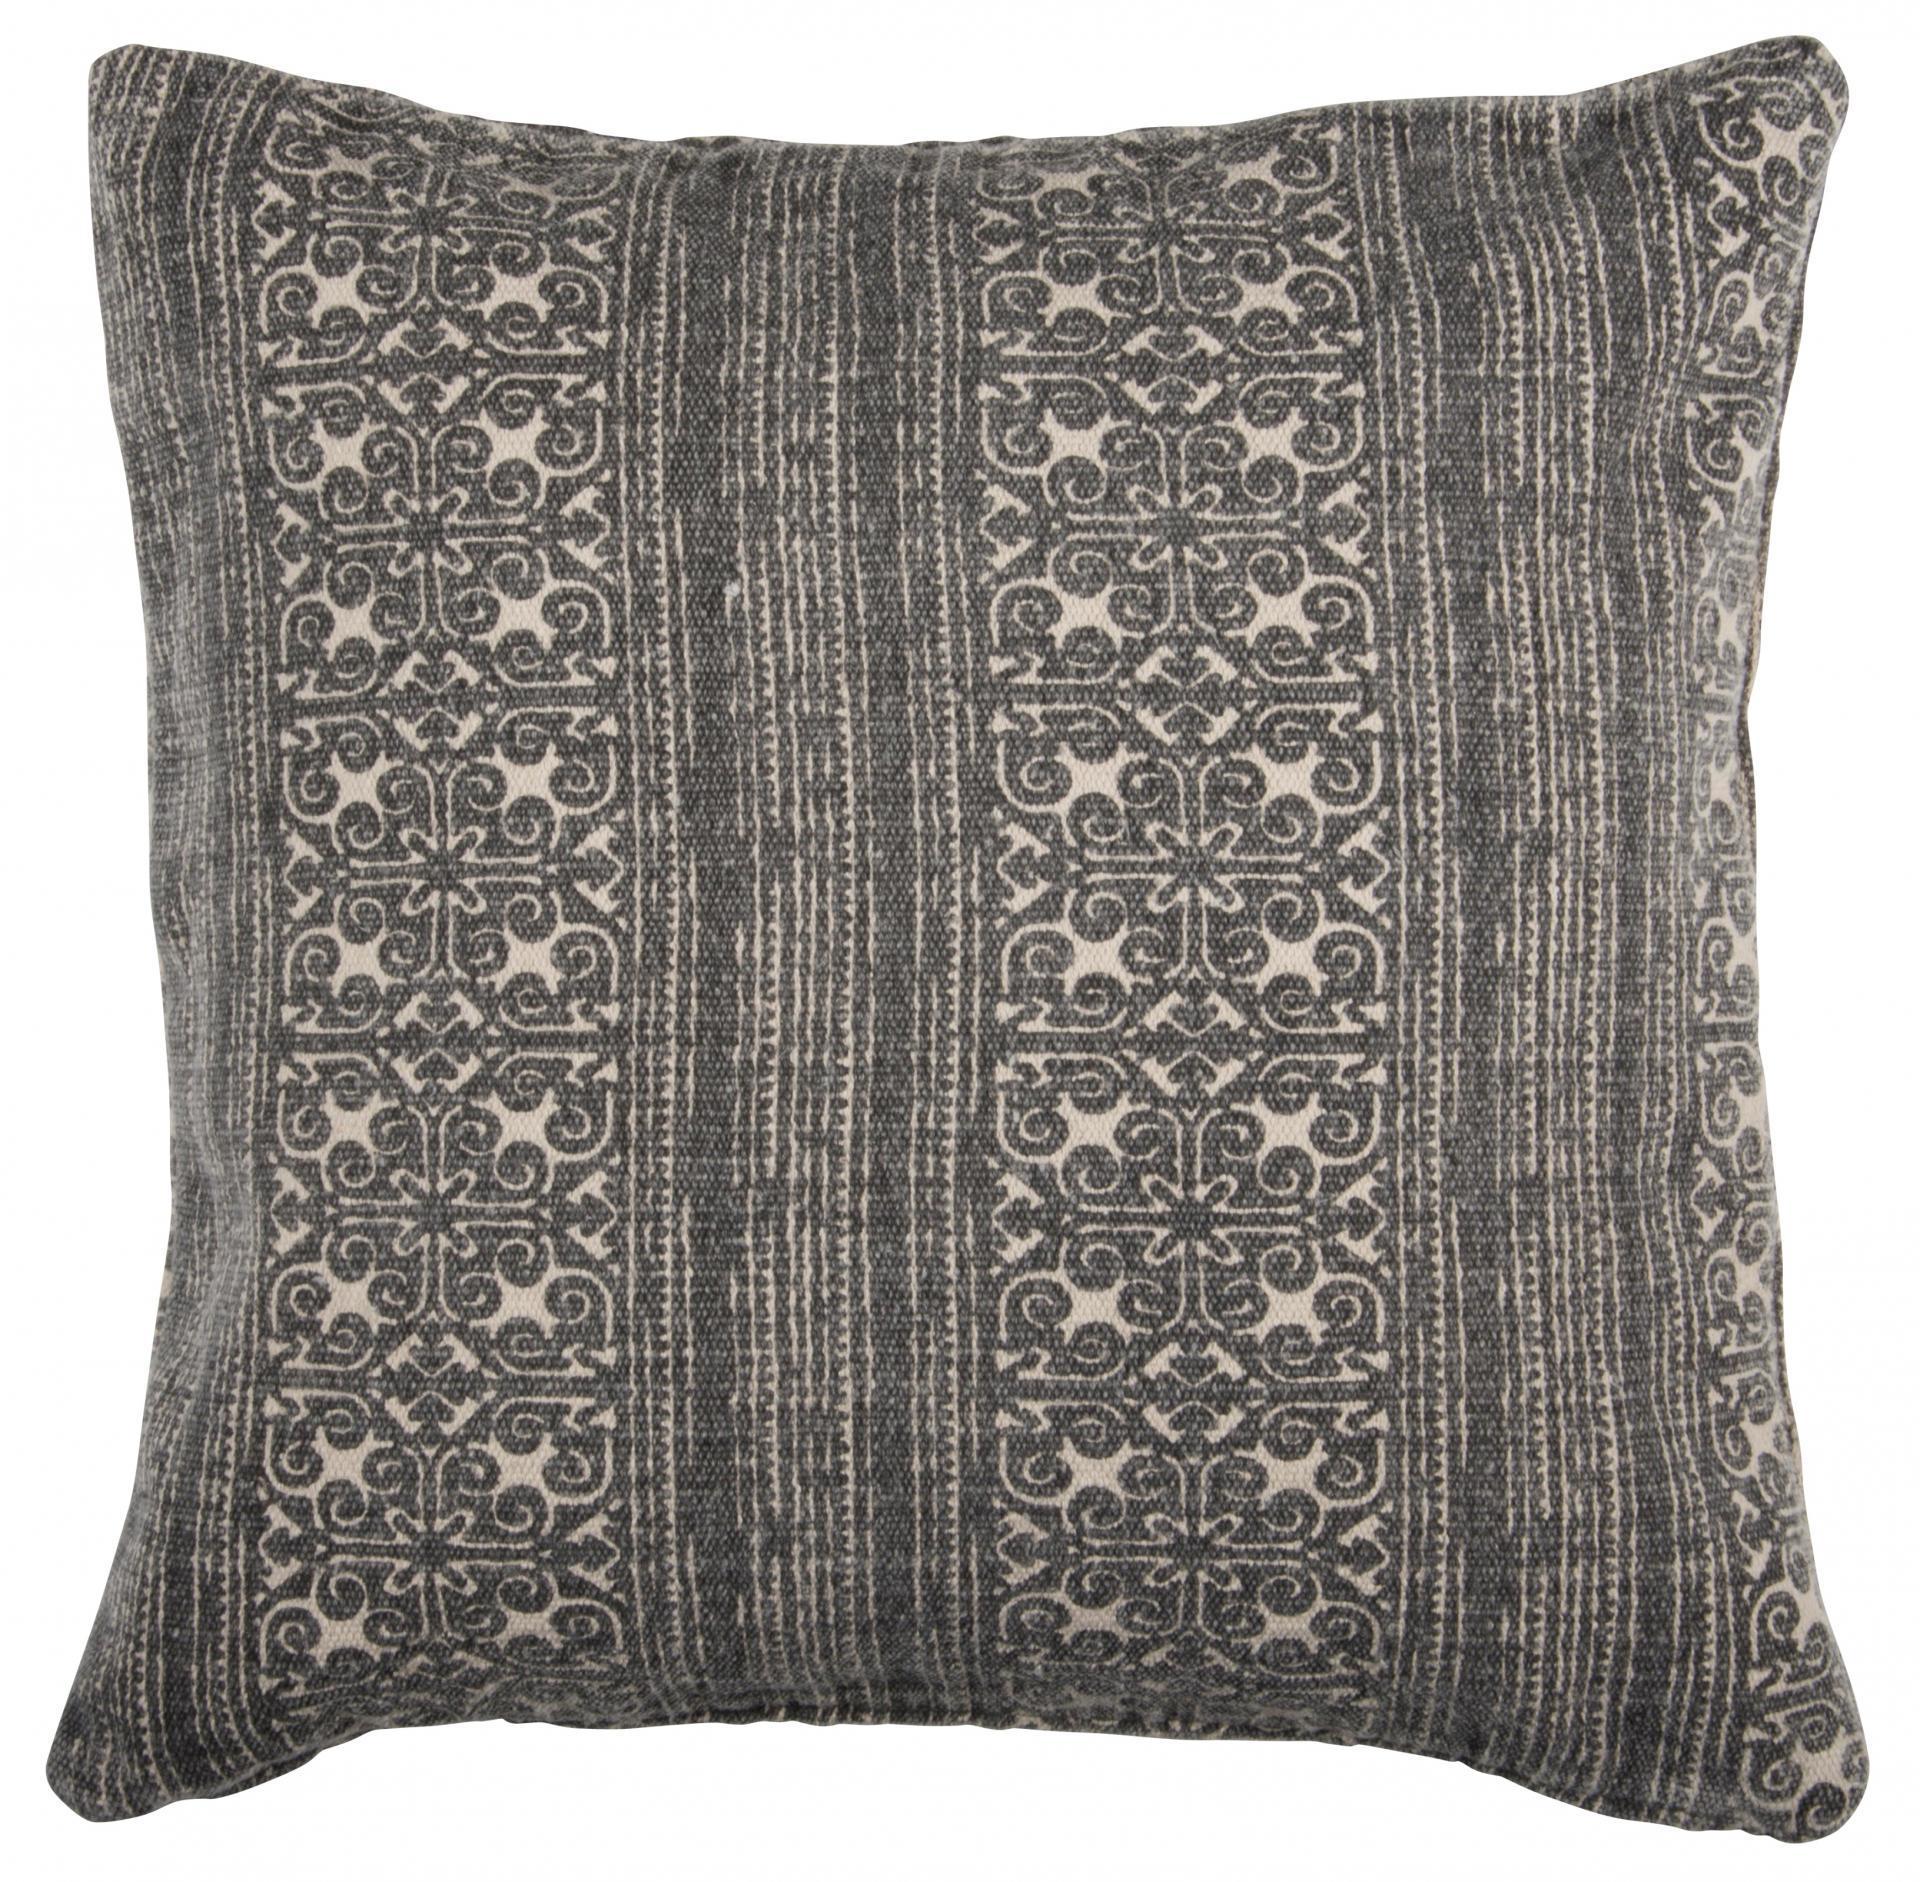 IB LAURSEN Povlak na polštář Black print 50x50, šedá barva, černá barva, textil